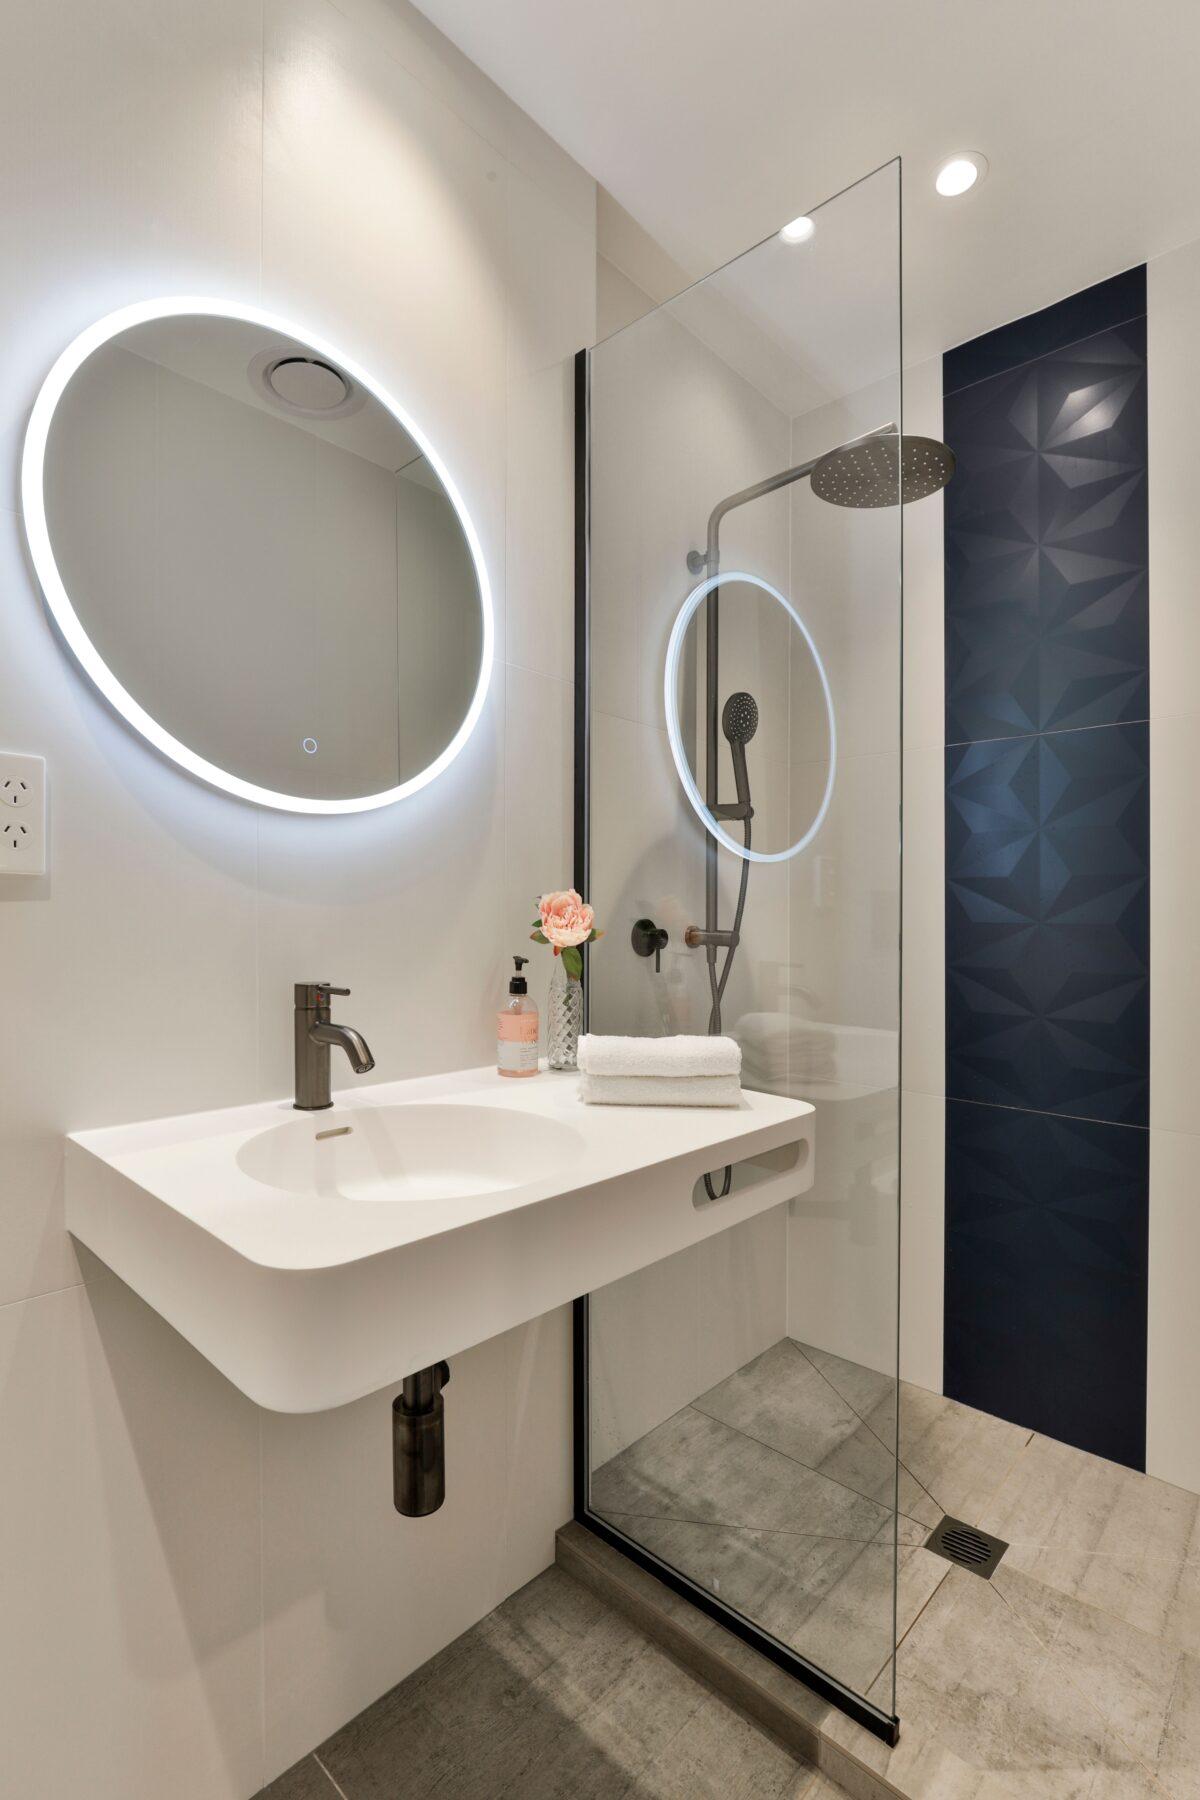 Black texture bathroom wall tiles, round LED mirror lights, simple bathroom styling